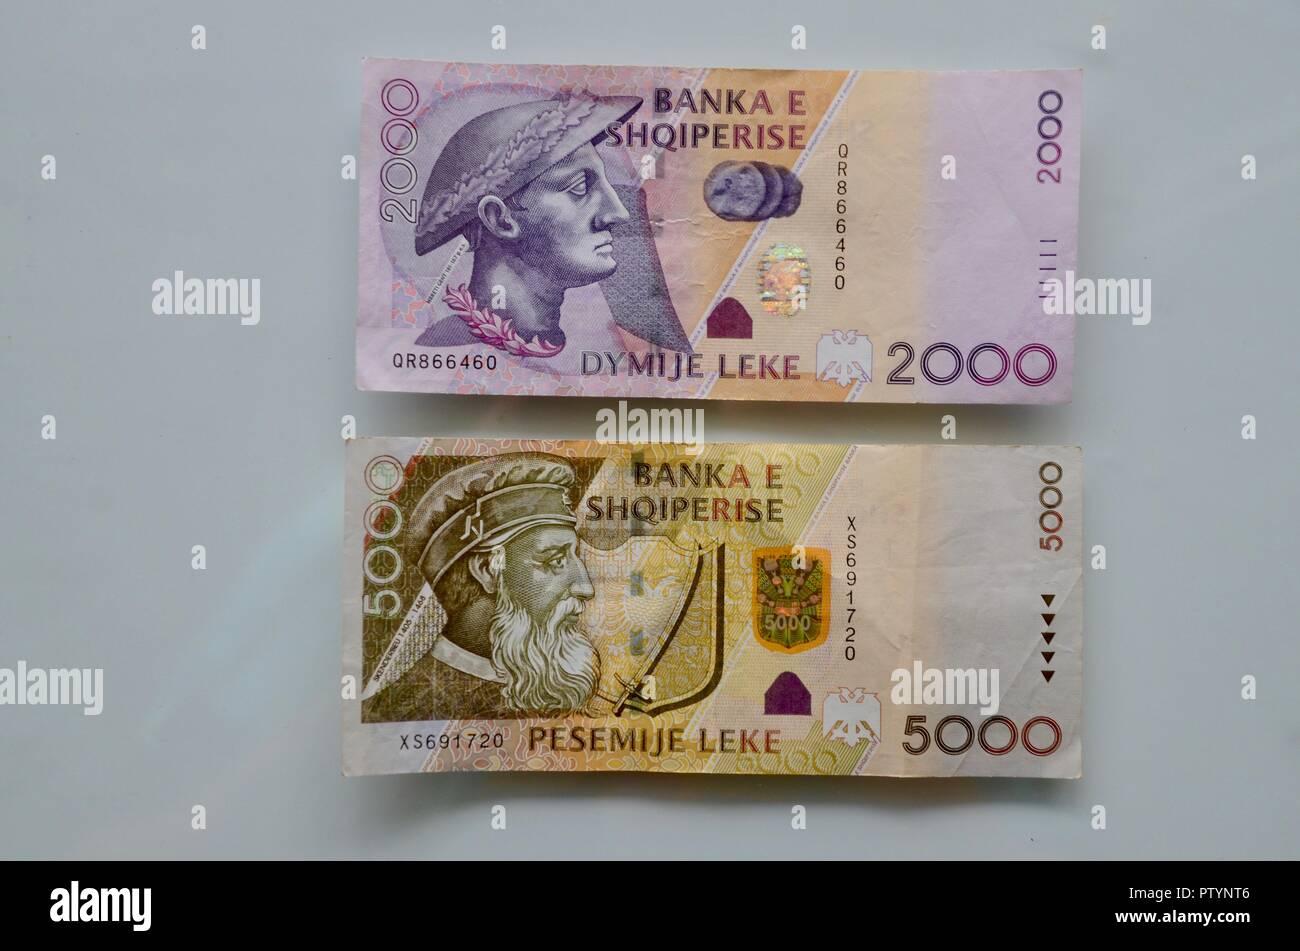 albanian bank notes 2000 and 5000 lek - Stock Image